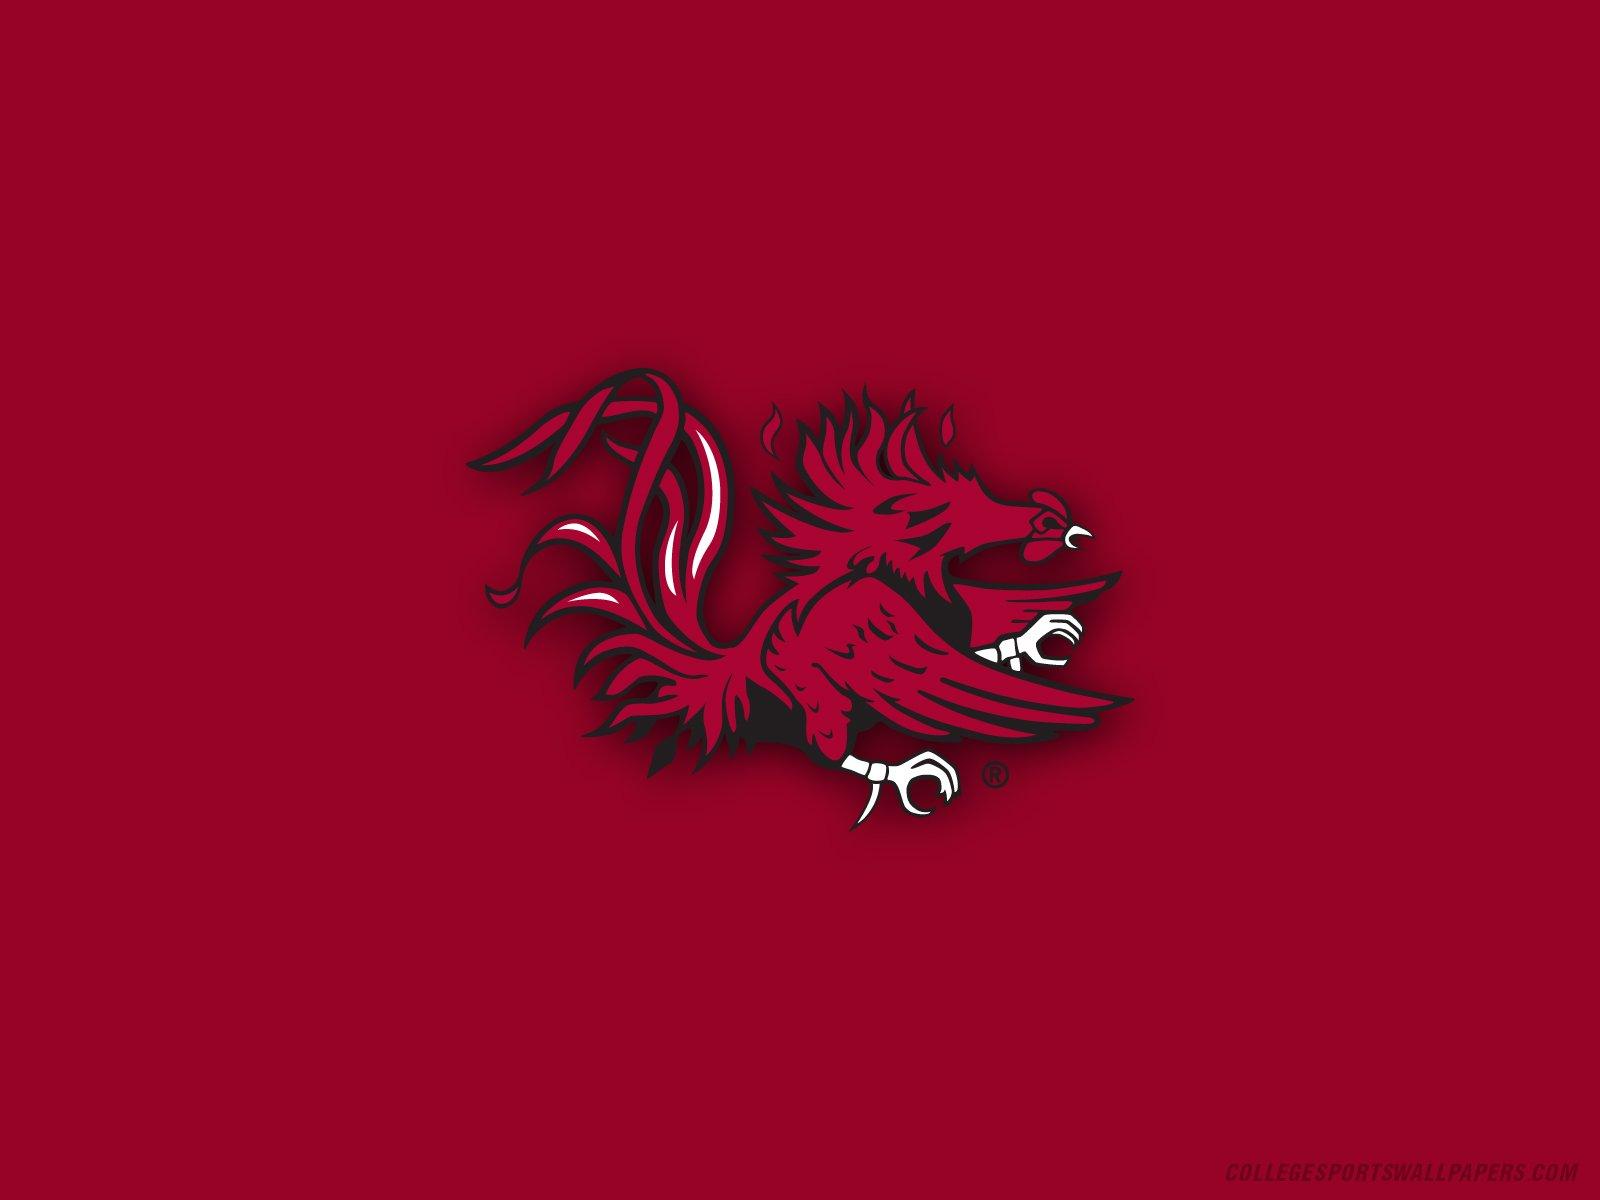 SOUTH CAROLINA GAMECOCKS college football wallpaper 1600x1200 1600x1200